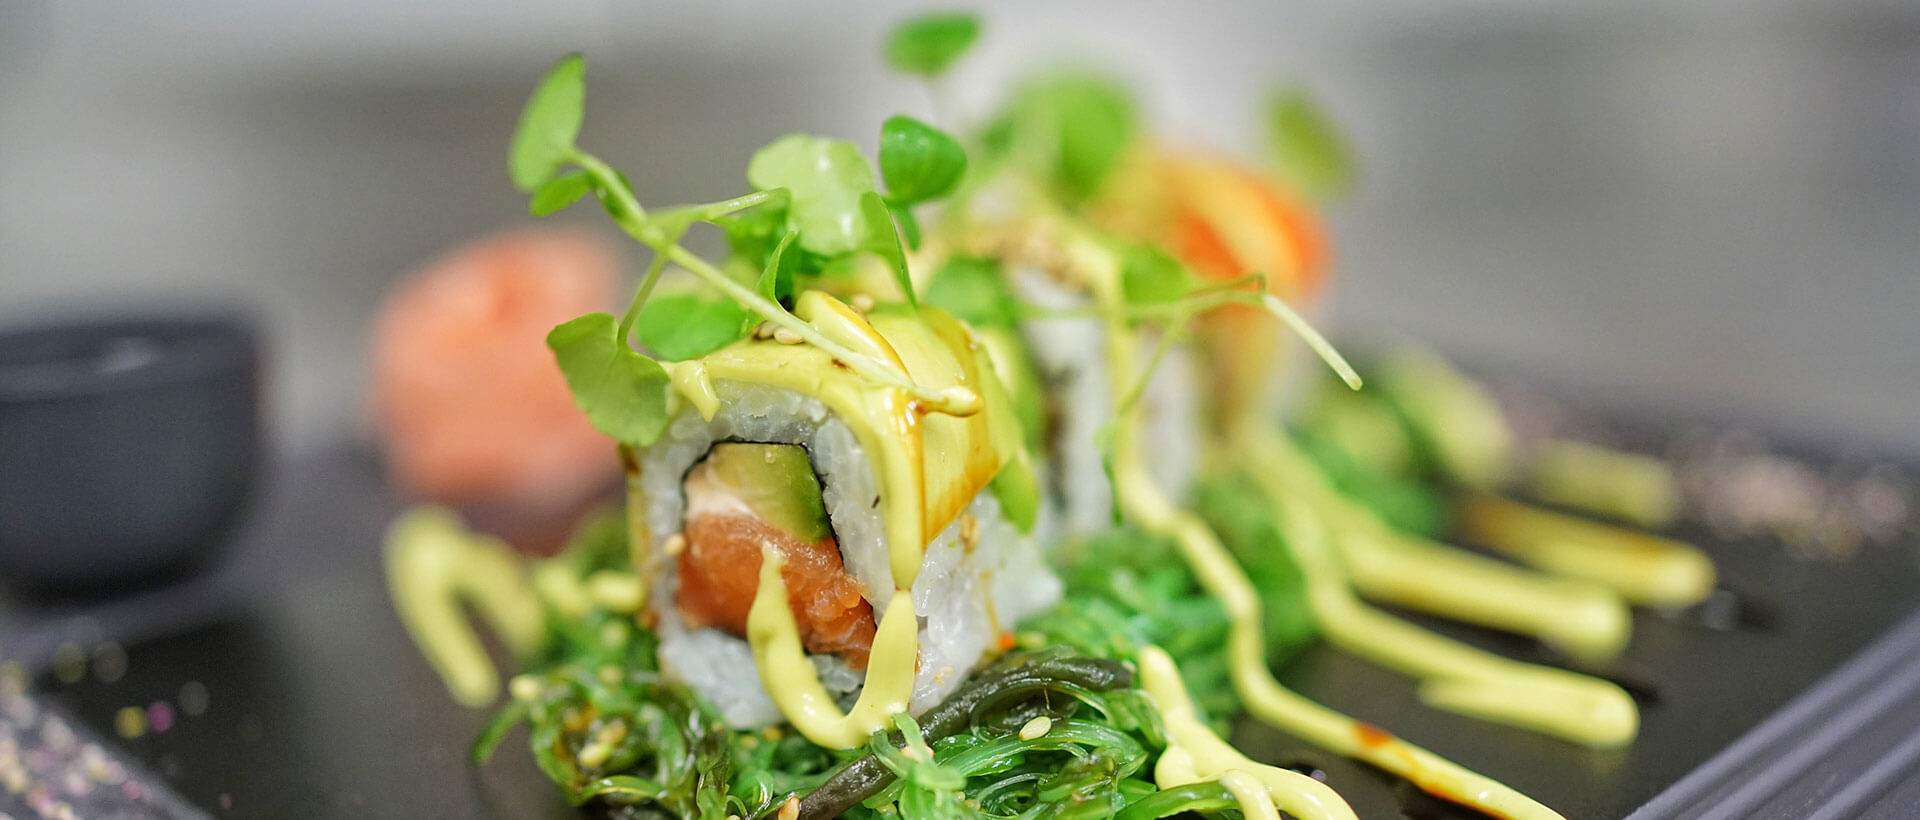 Sushi im Marburger Esszimmer